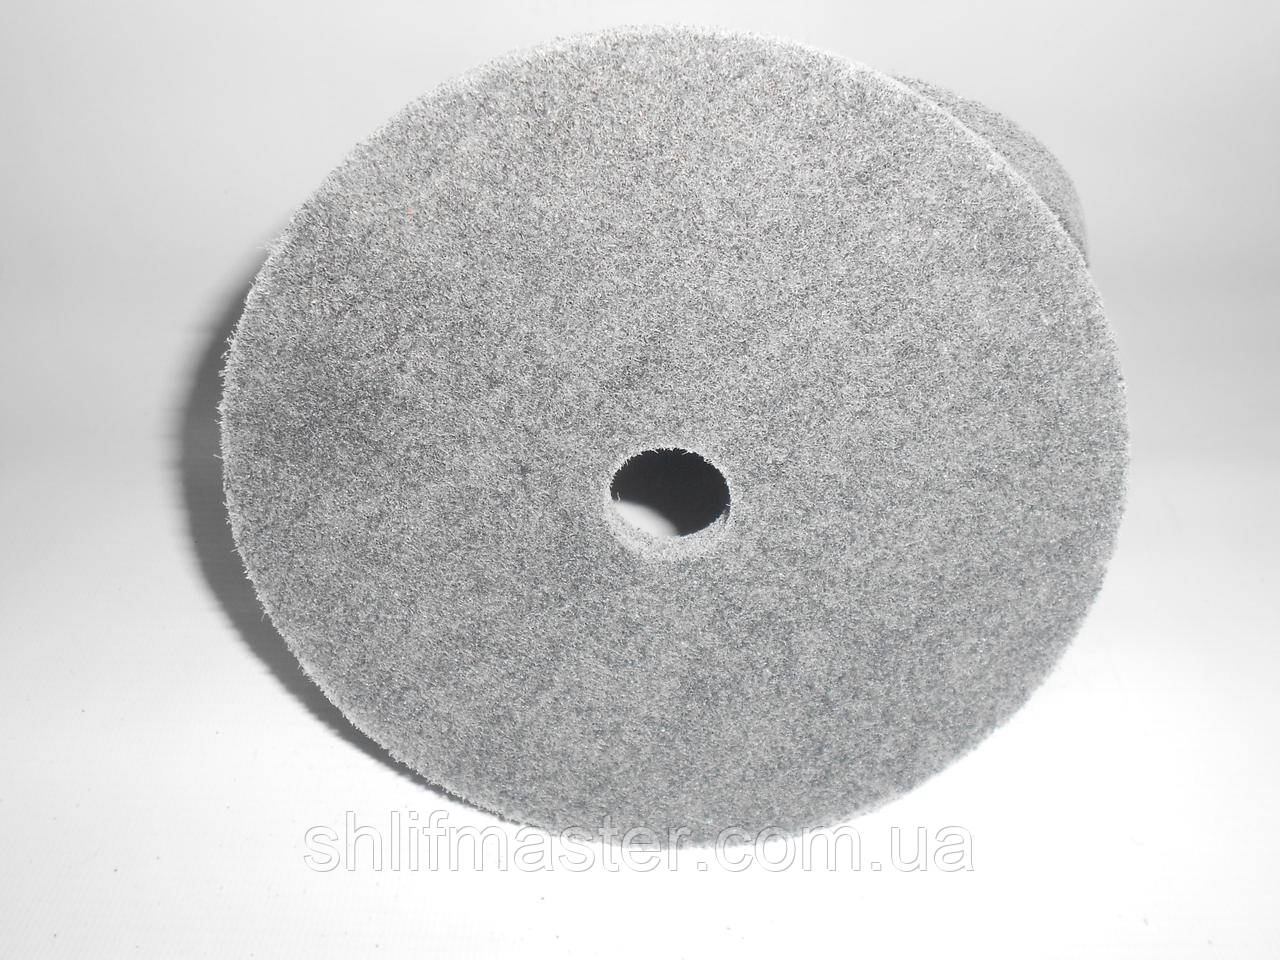 пенистый бетон